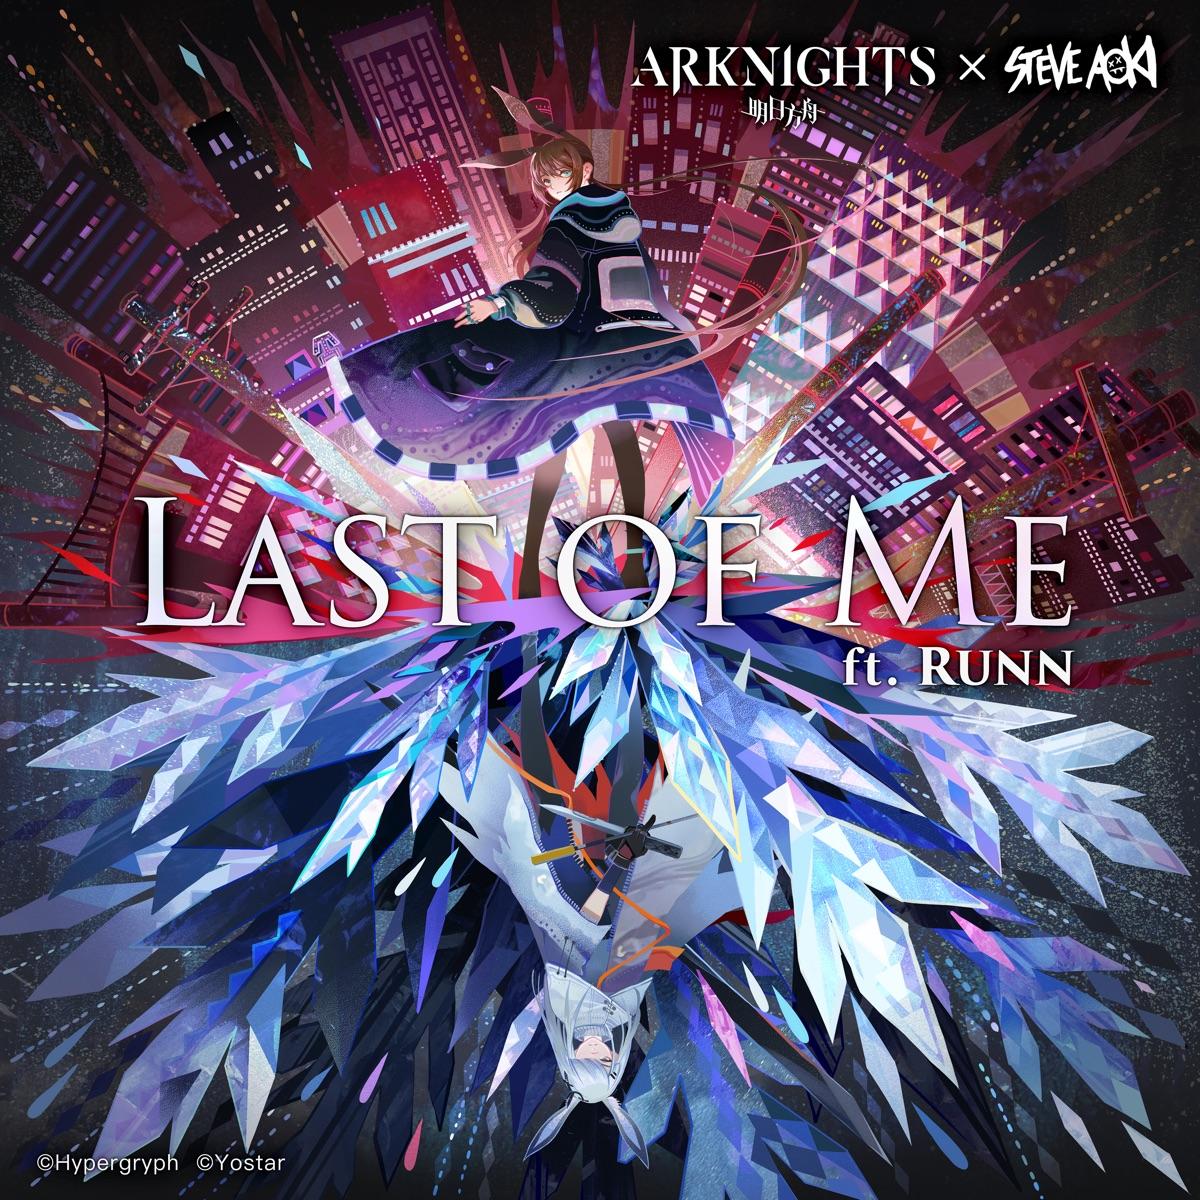 『Steve Aoki - Last of Me feat. RUNN 歌詞』収録の『Last of Me feat. RUNN』ジャケット